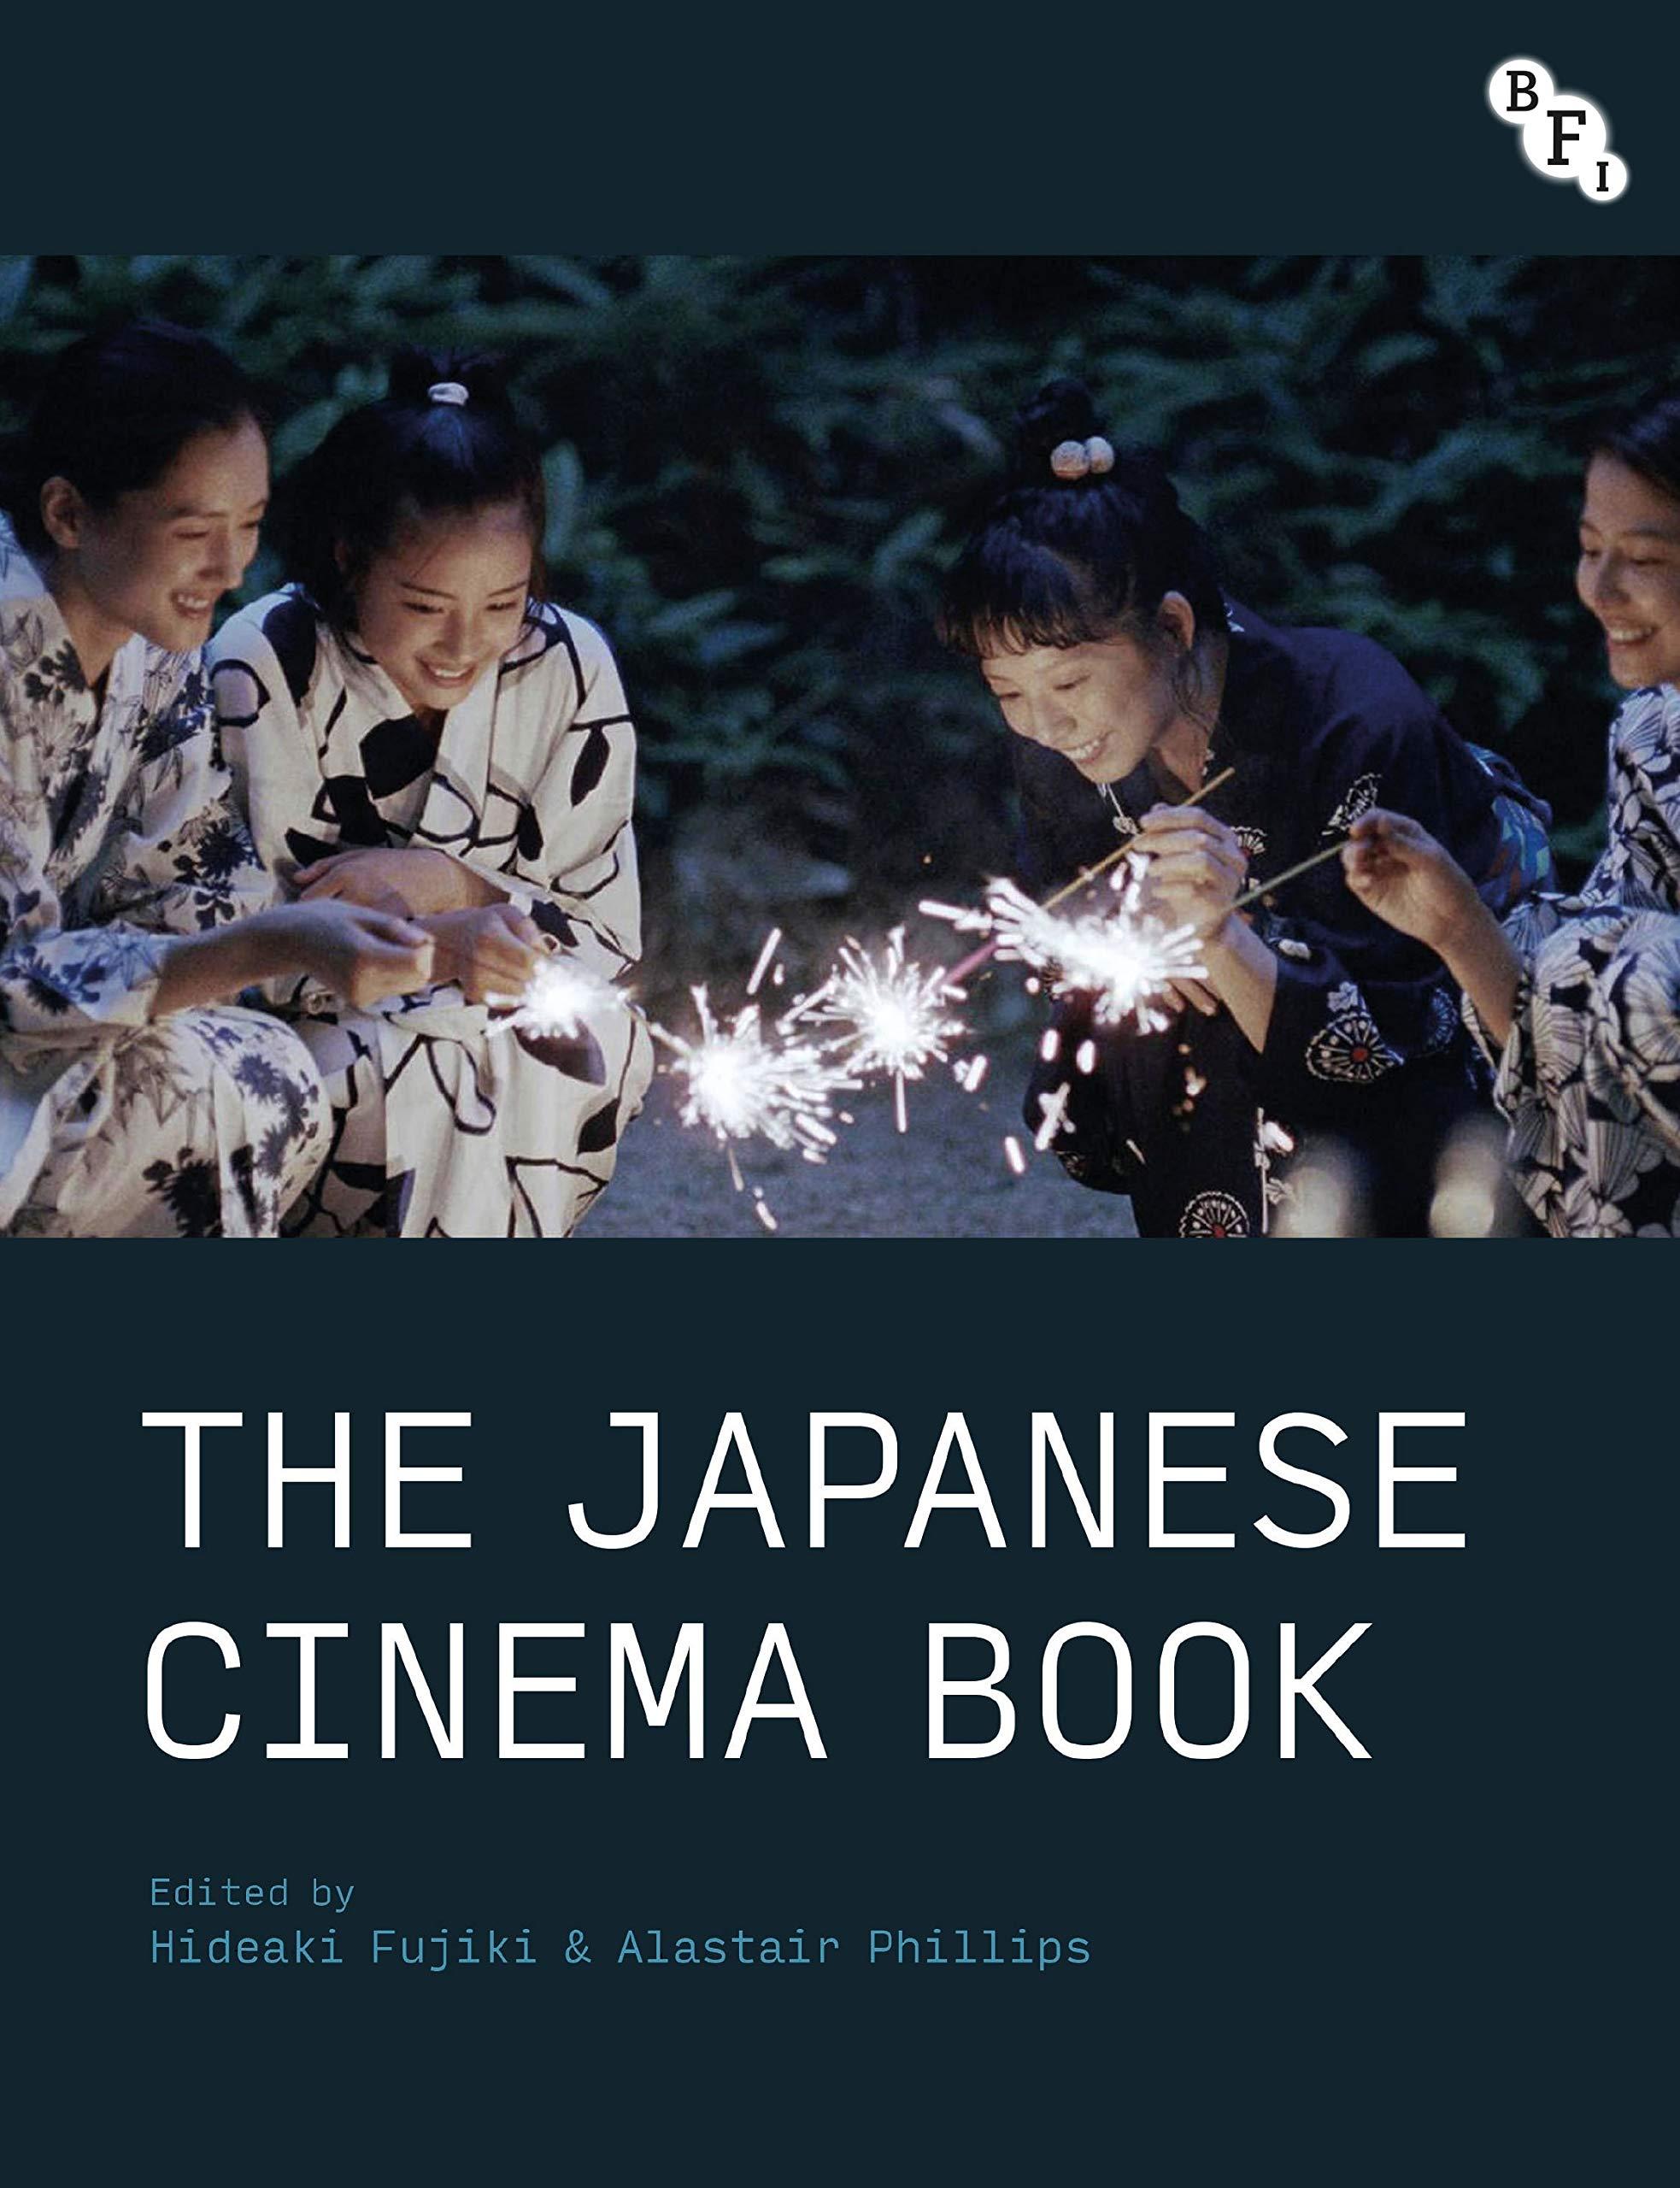 Buy The Japanese Cinema Book